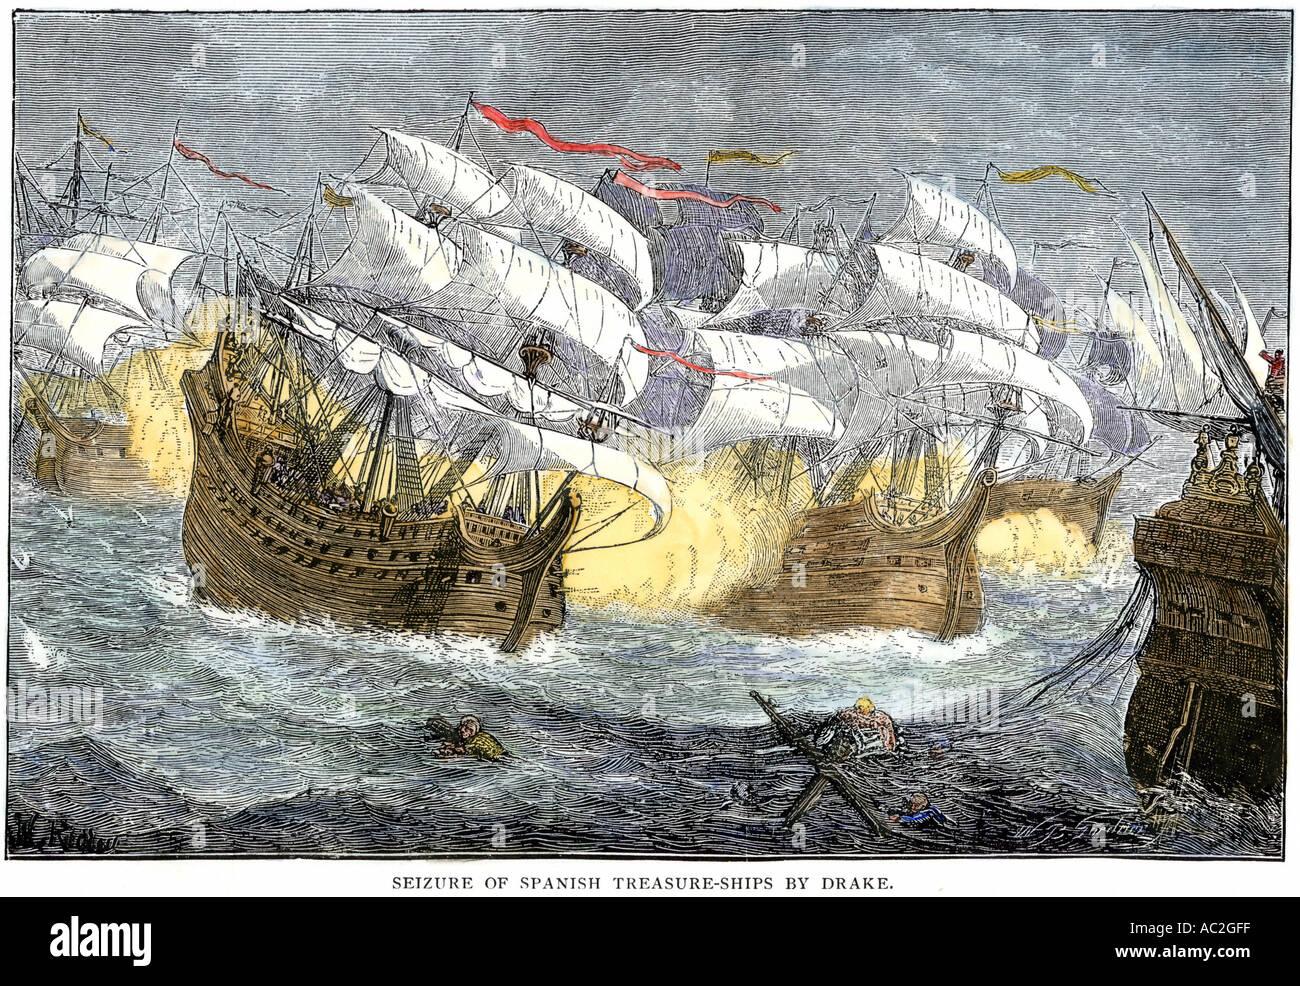 Seizure of Spanish treasure ships by the English fleet of Sir Francis Drake. Hand-colored woodcut - Stock Image